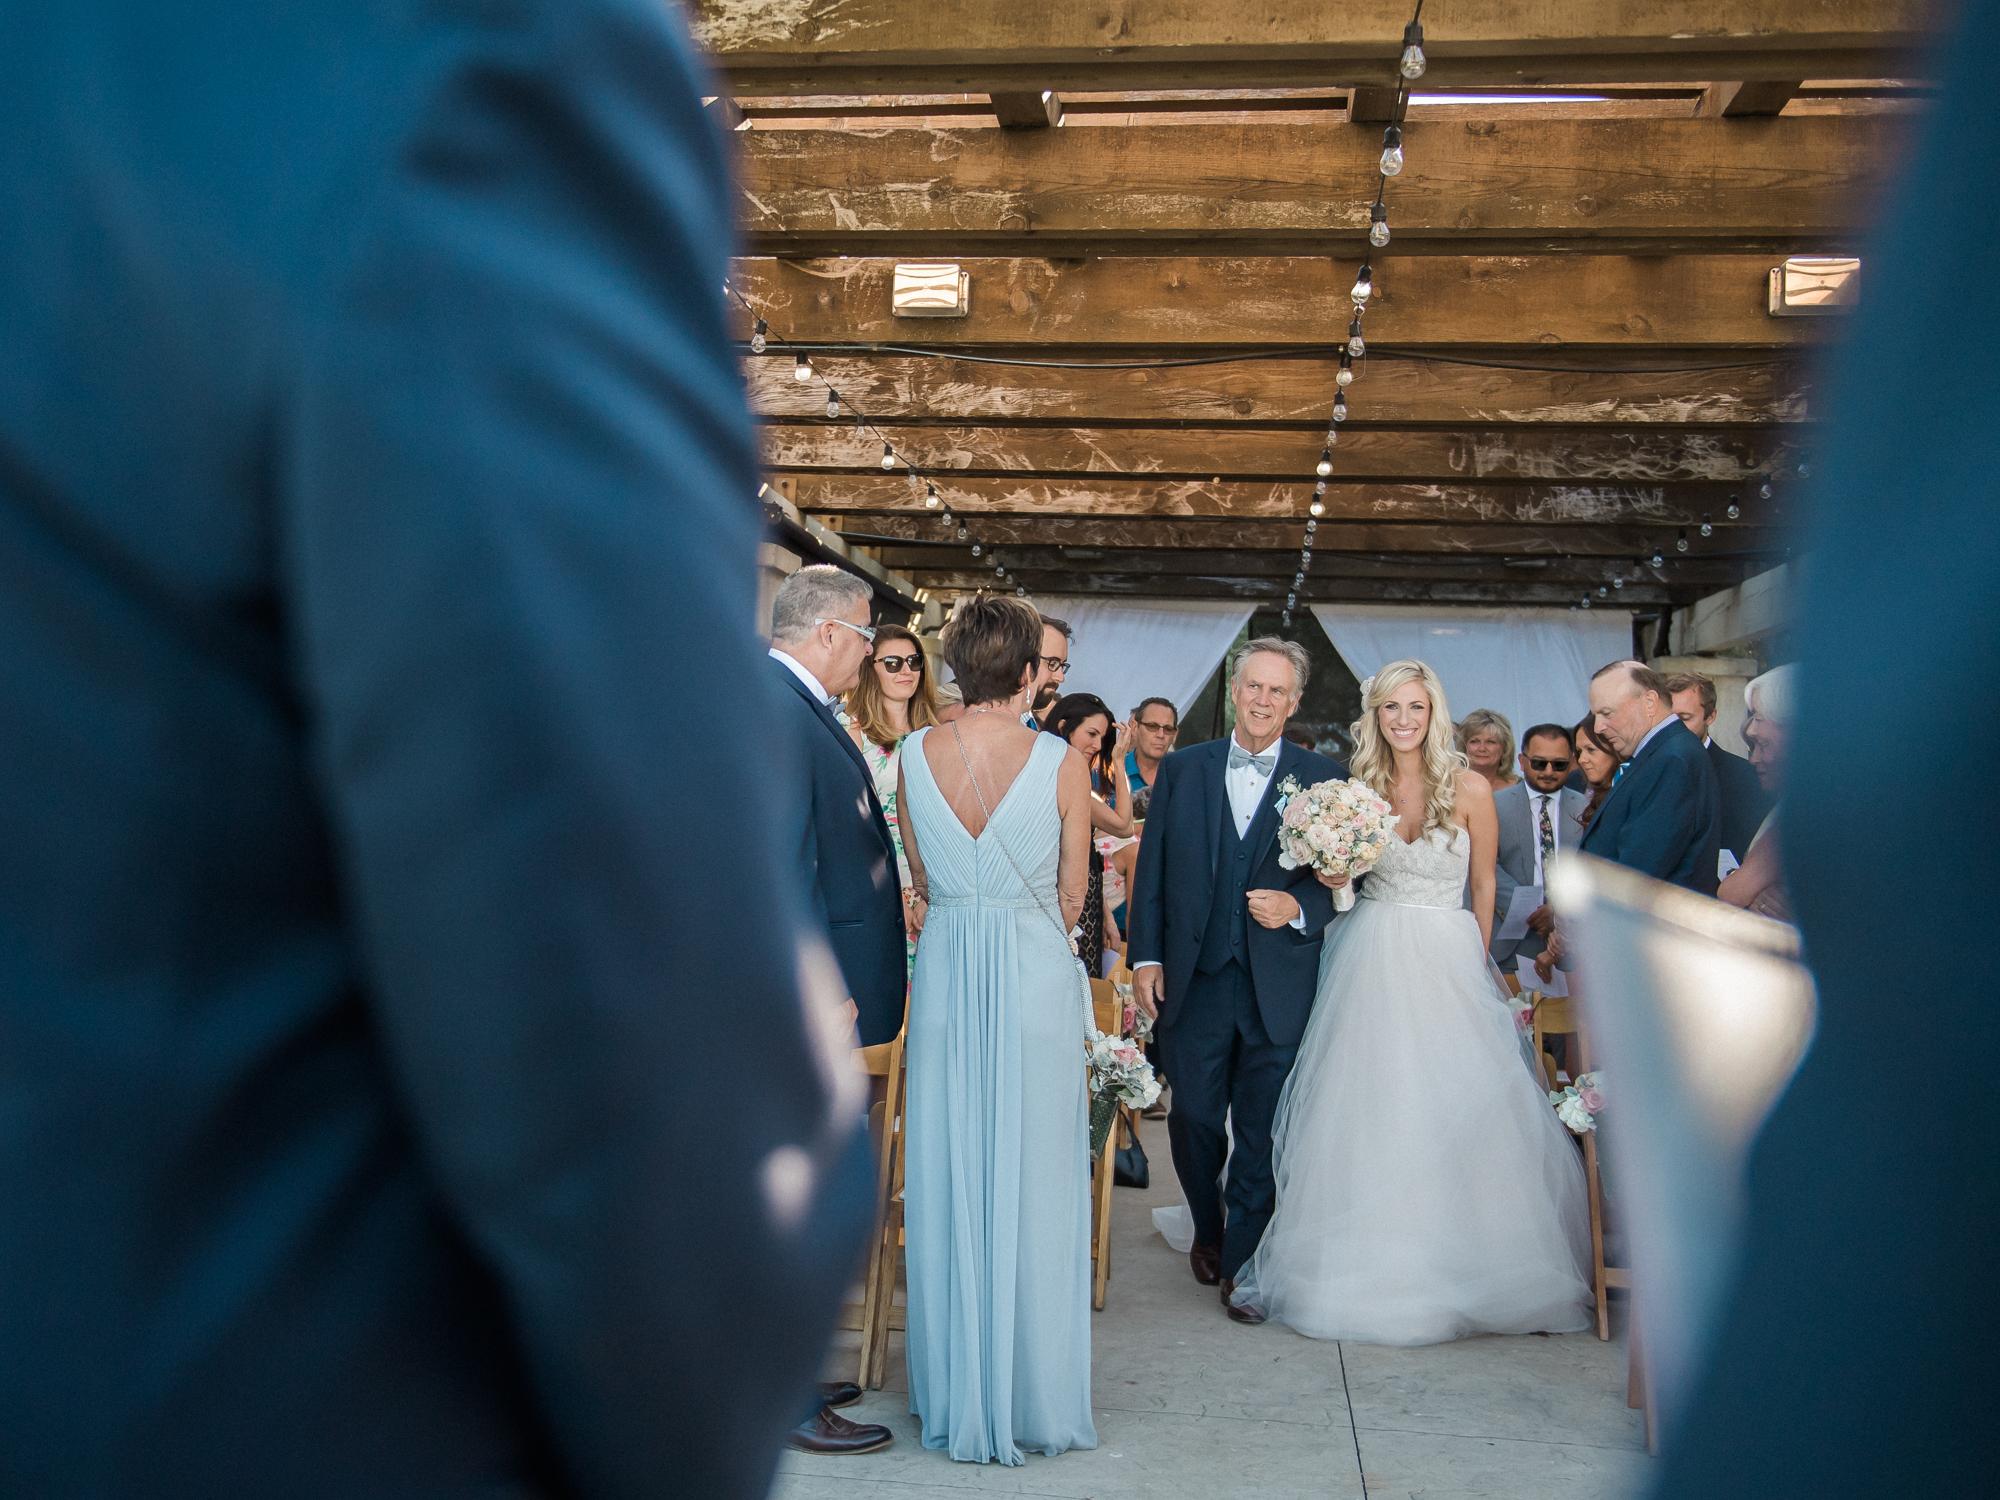 Aimee+Logan_wedding_spp-84.jpg